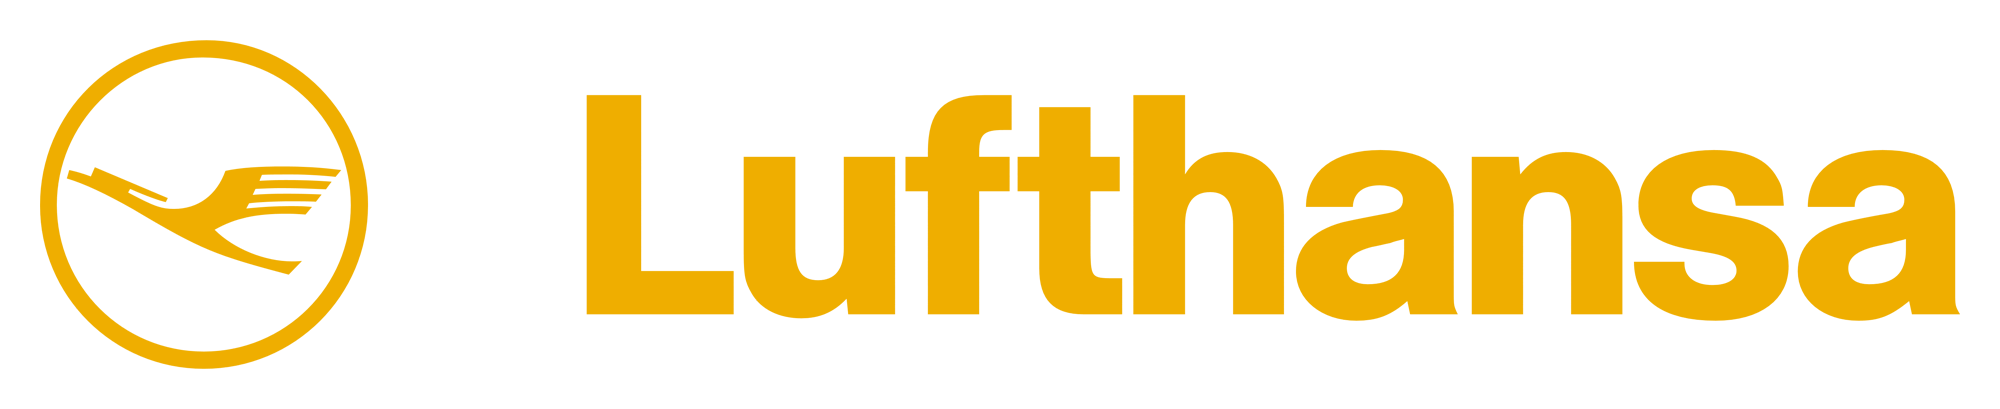 Resultado de imagen para Lufthansa logo